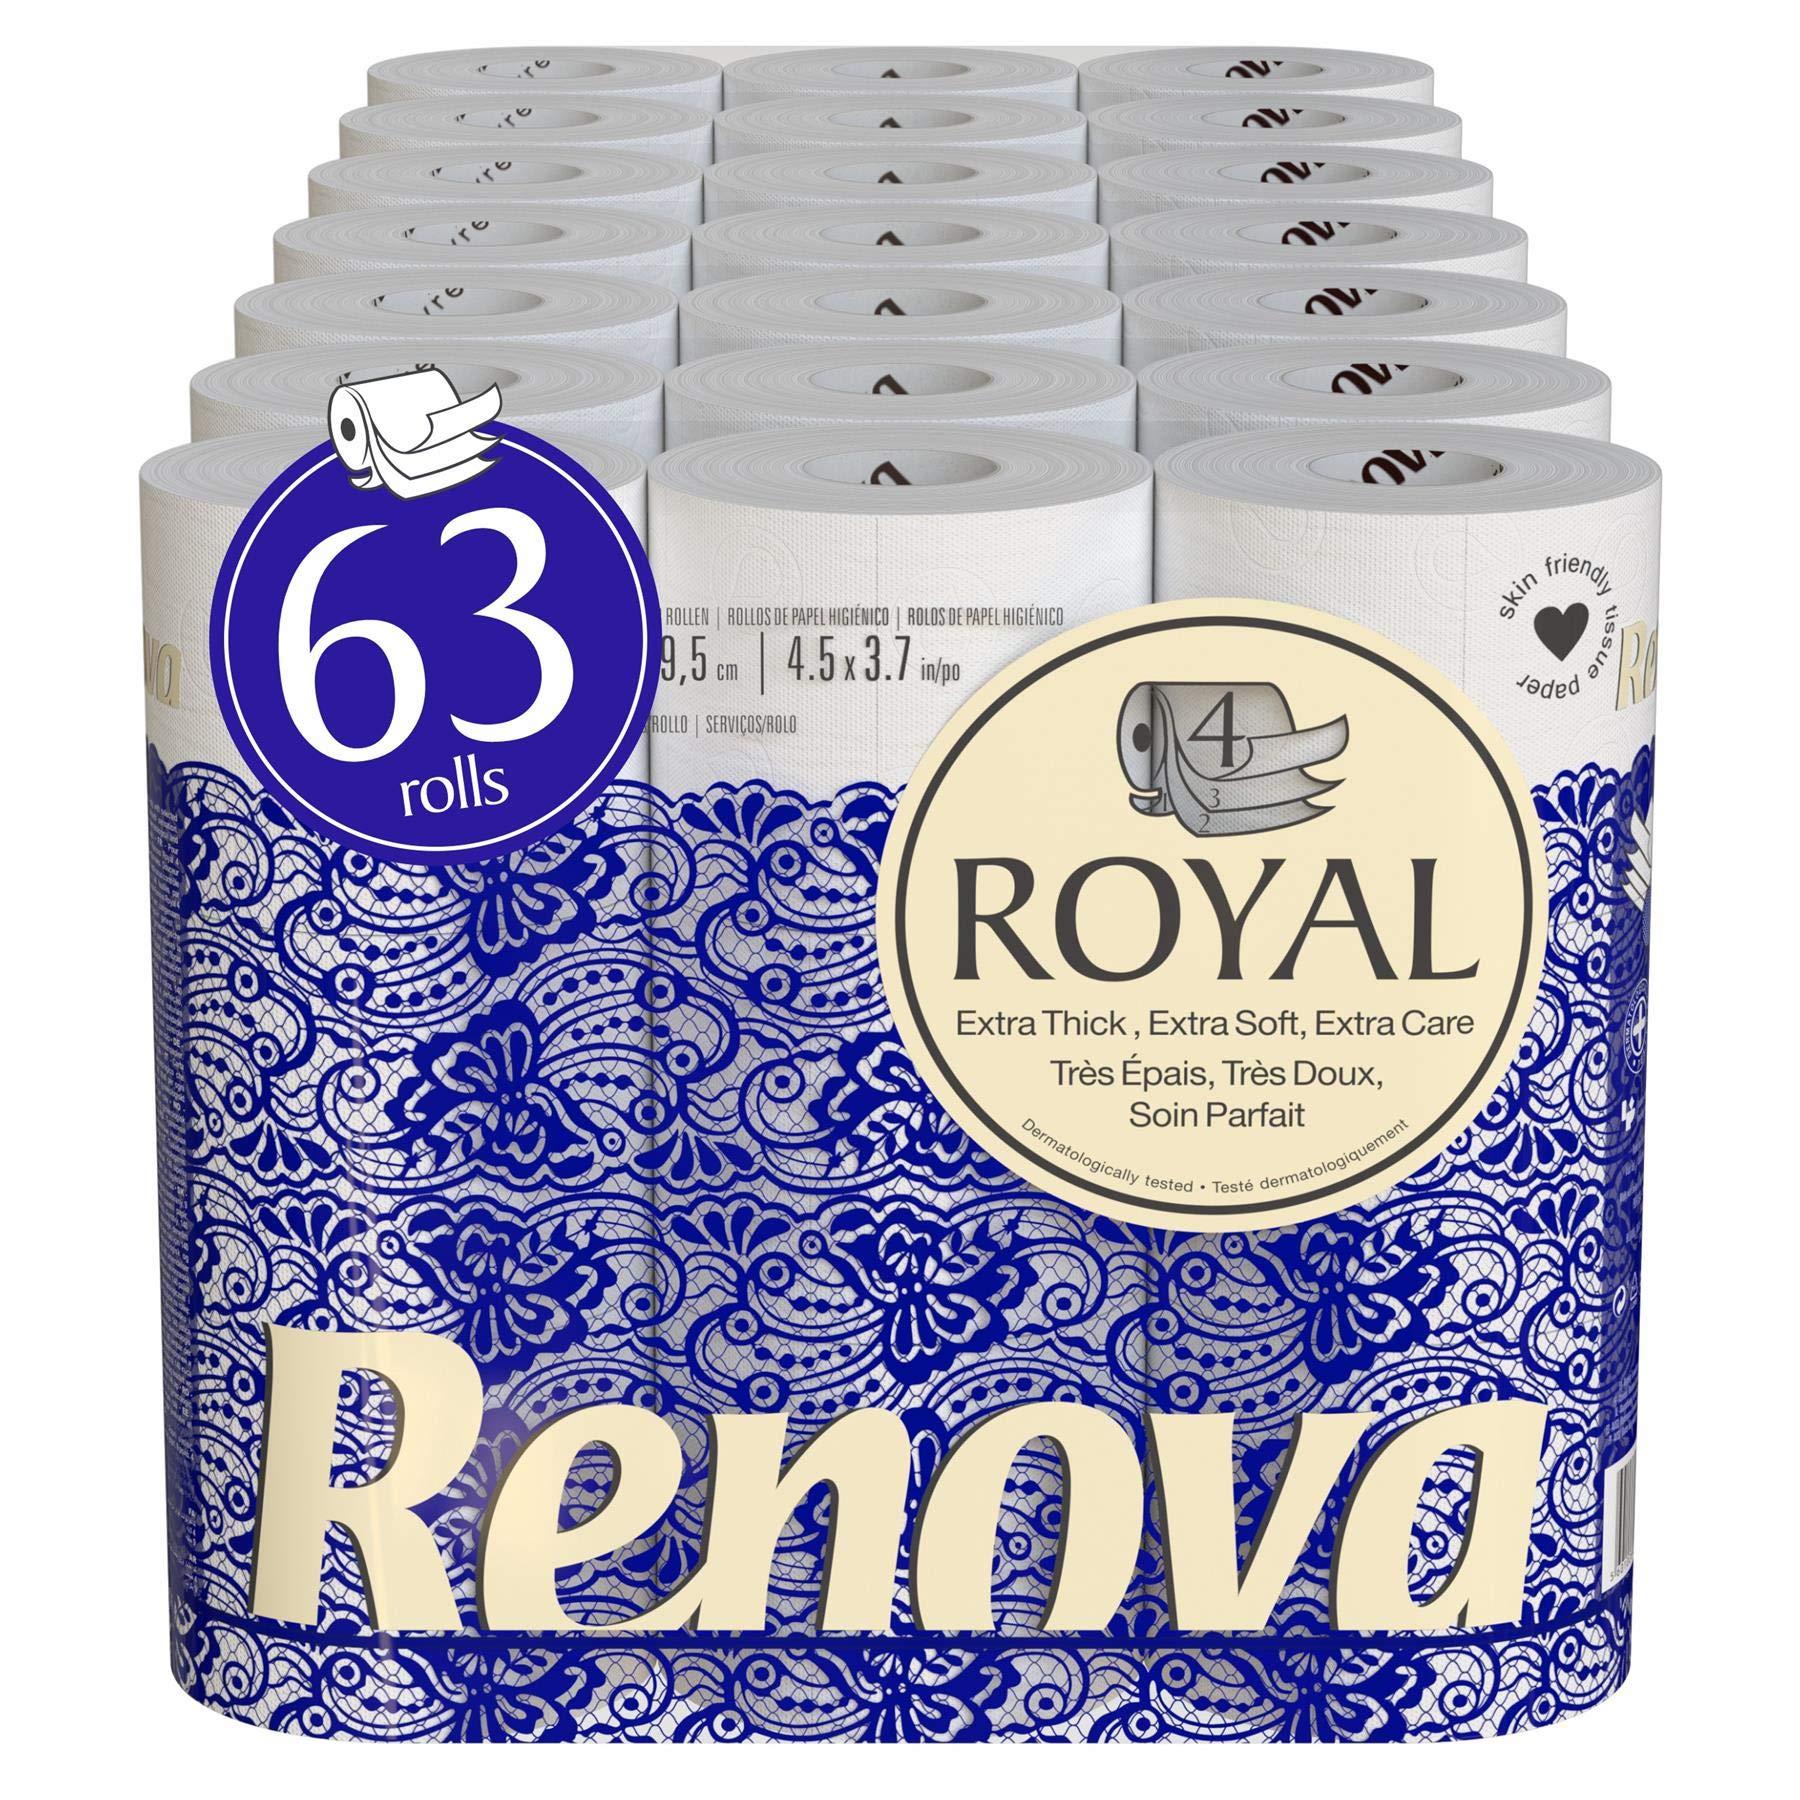 Renova Royal 63 Rolls - 4 Ply Soft Luxury White Toilet Paper Tissue Rolls